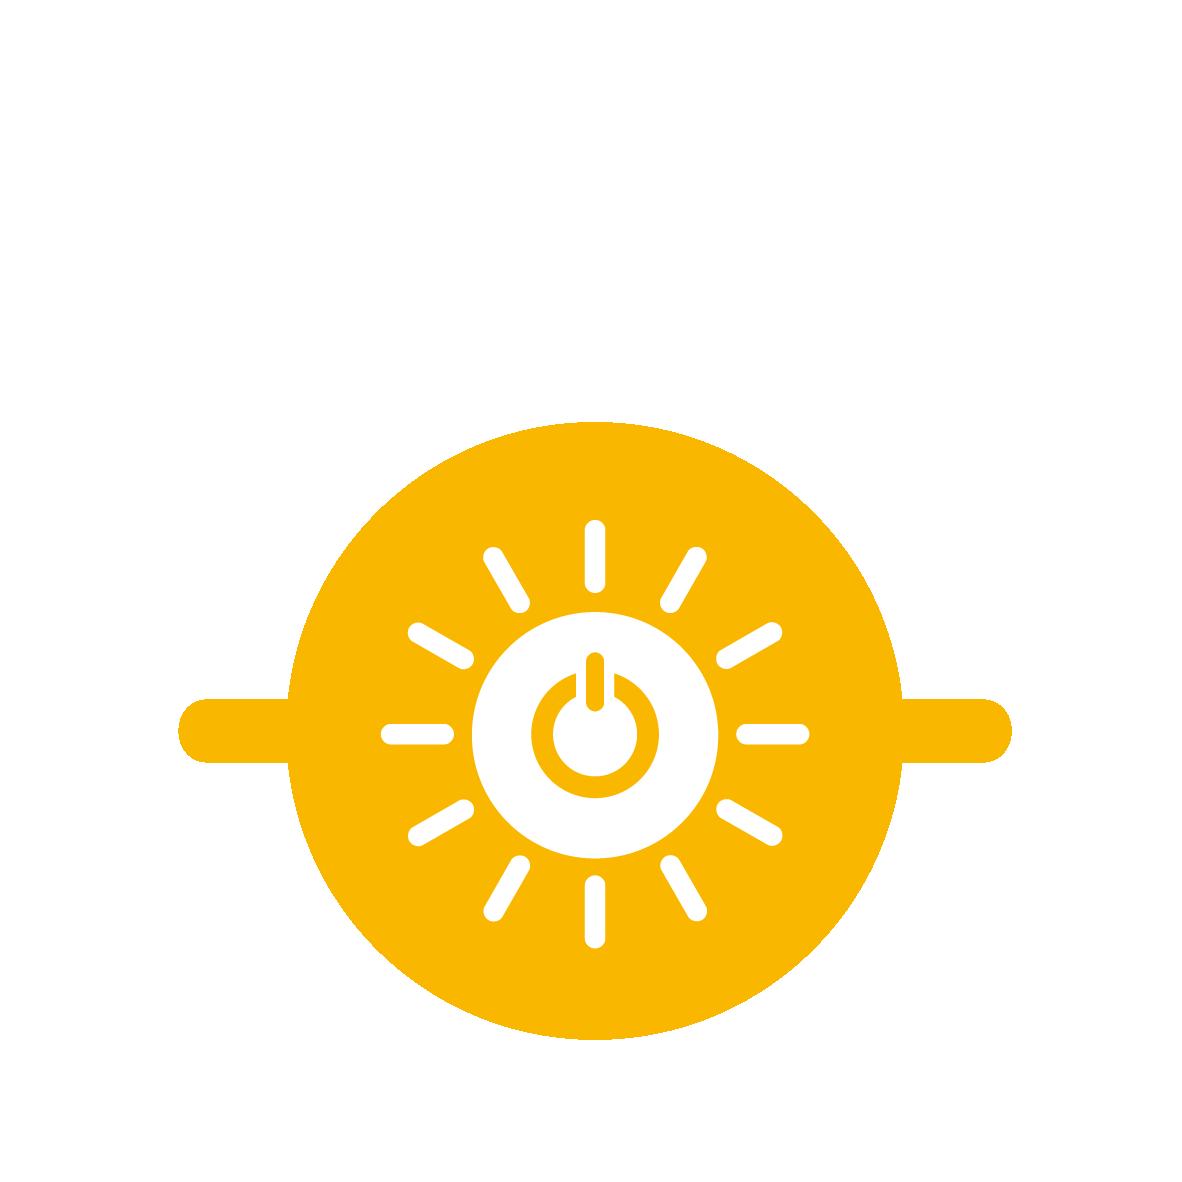 Energias renováveis e acessíveis